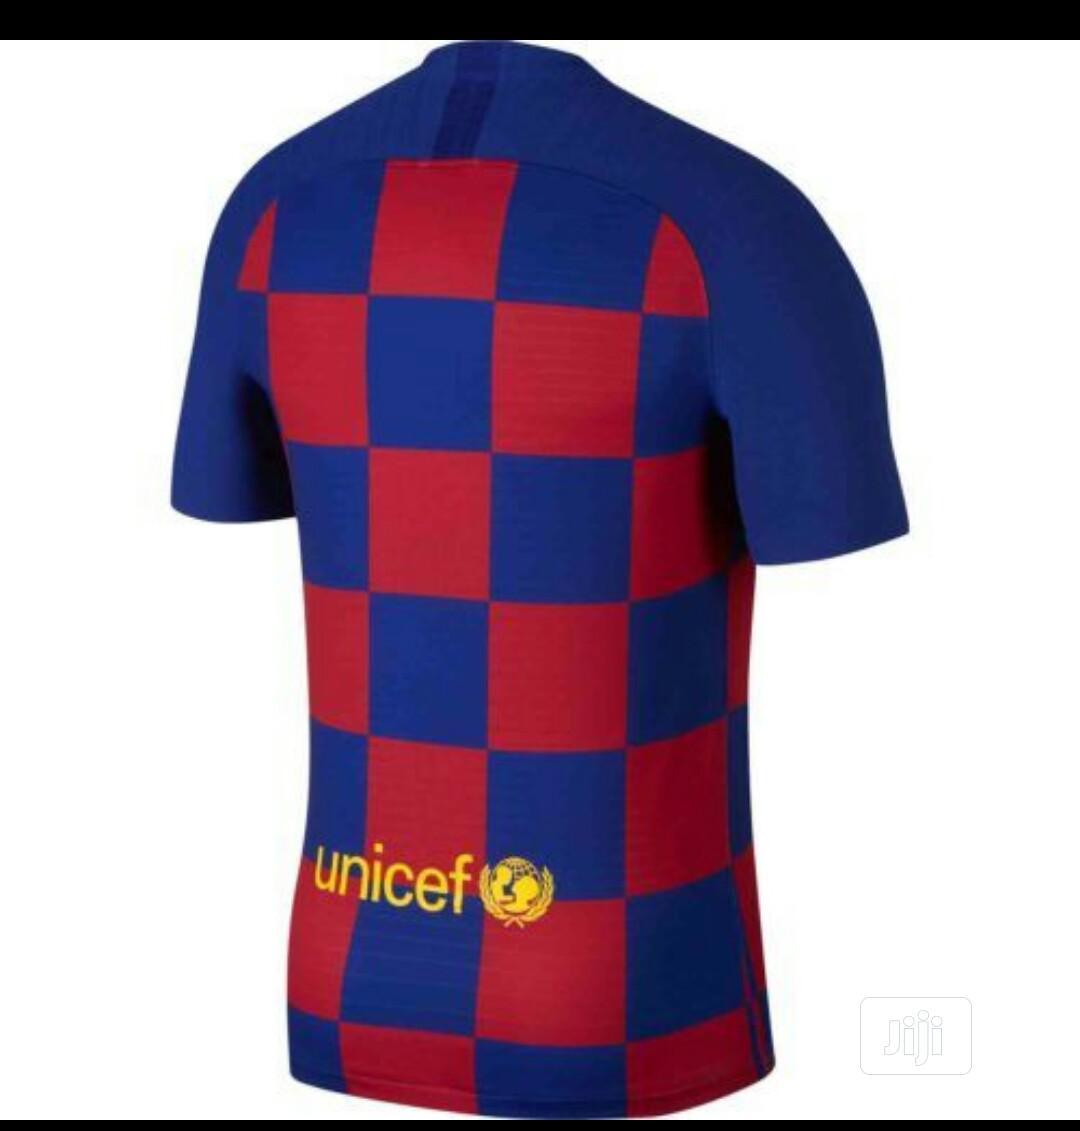 Fc Barca New Season Jersey | Sports Equipment for sale in Owerri, Imo State, Nigeria